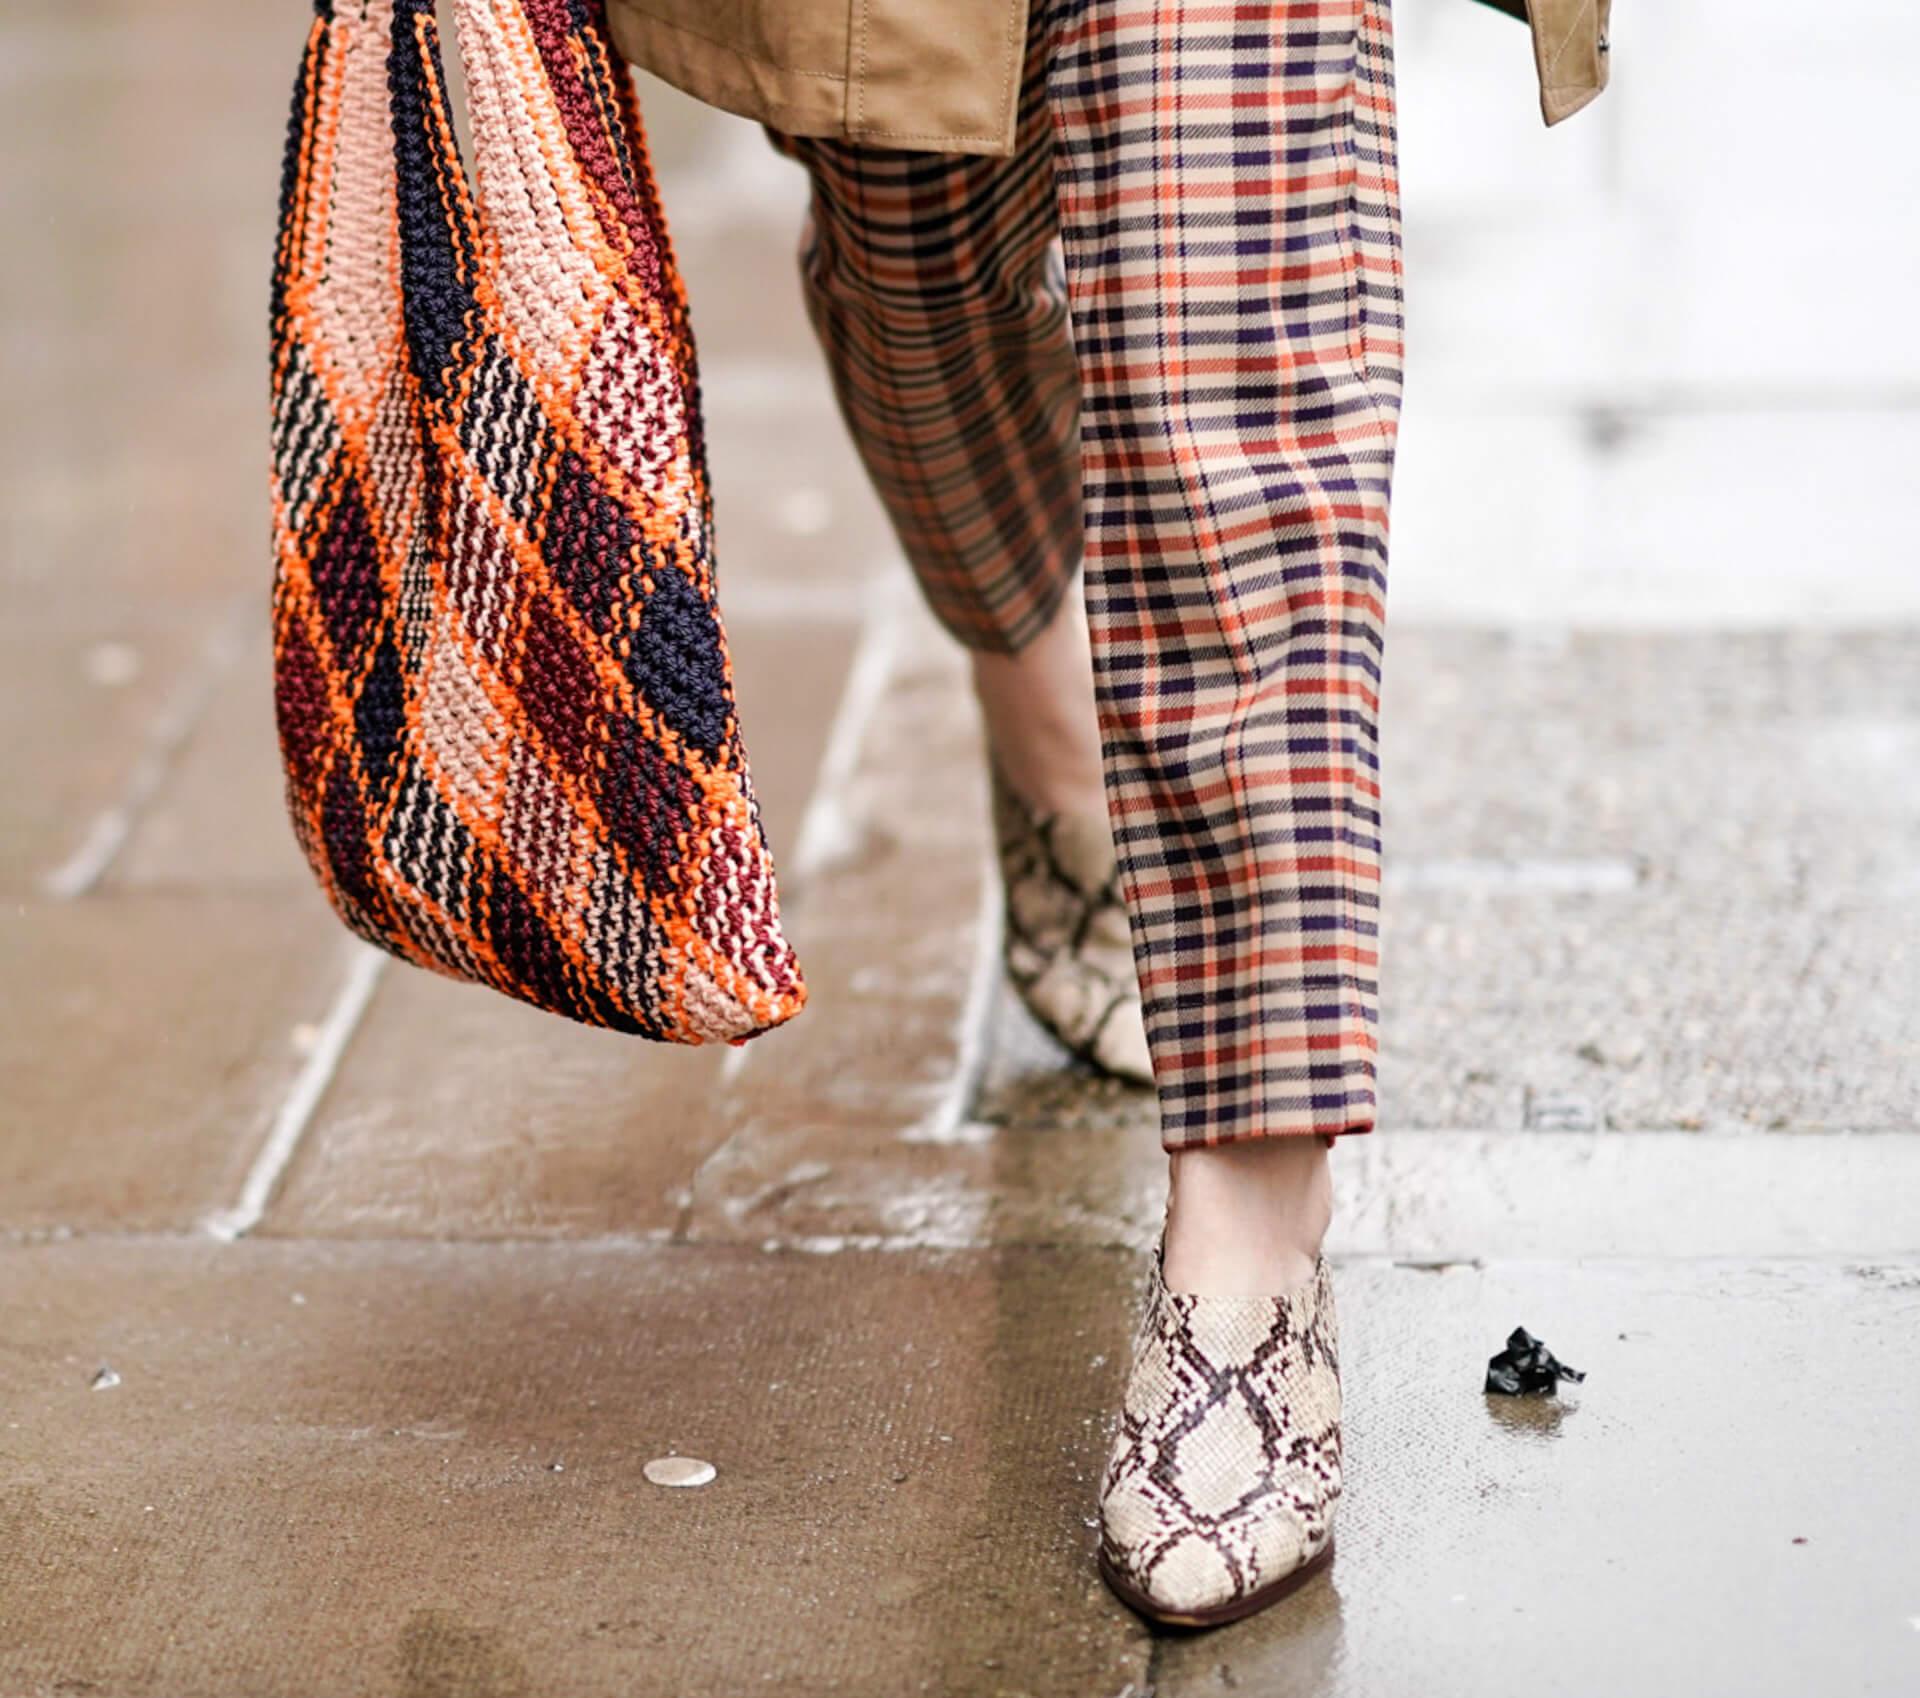 Animalprint Schuhe Shoe Fashion